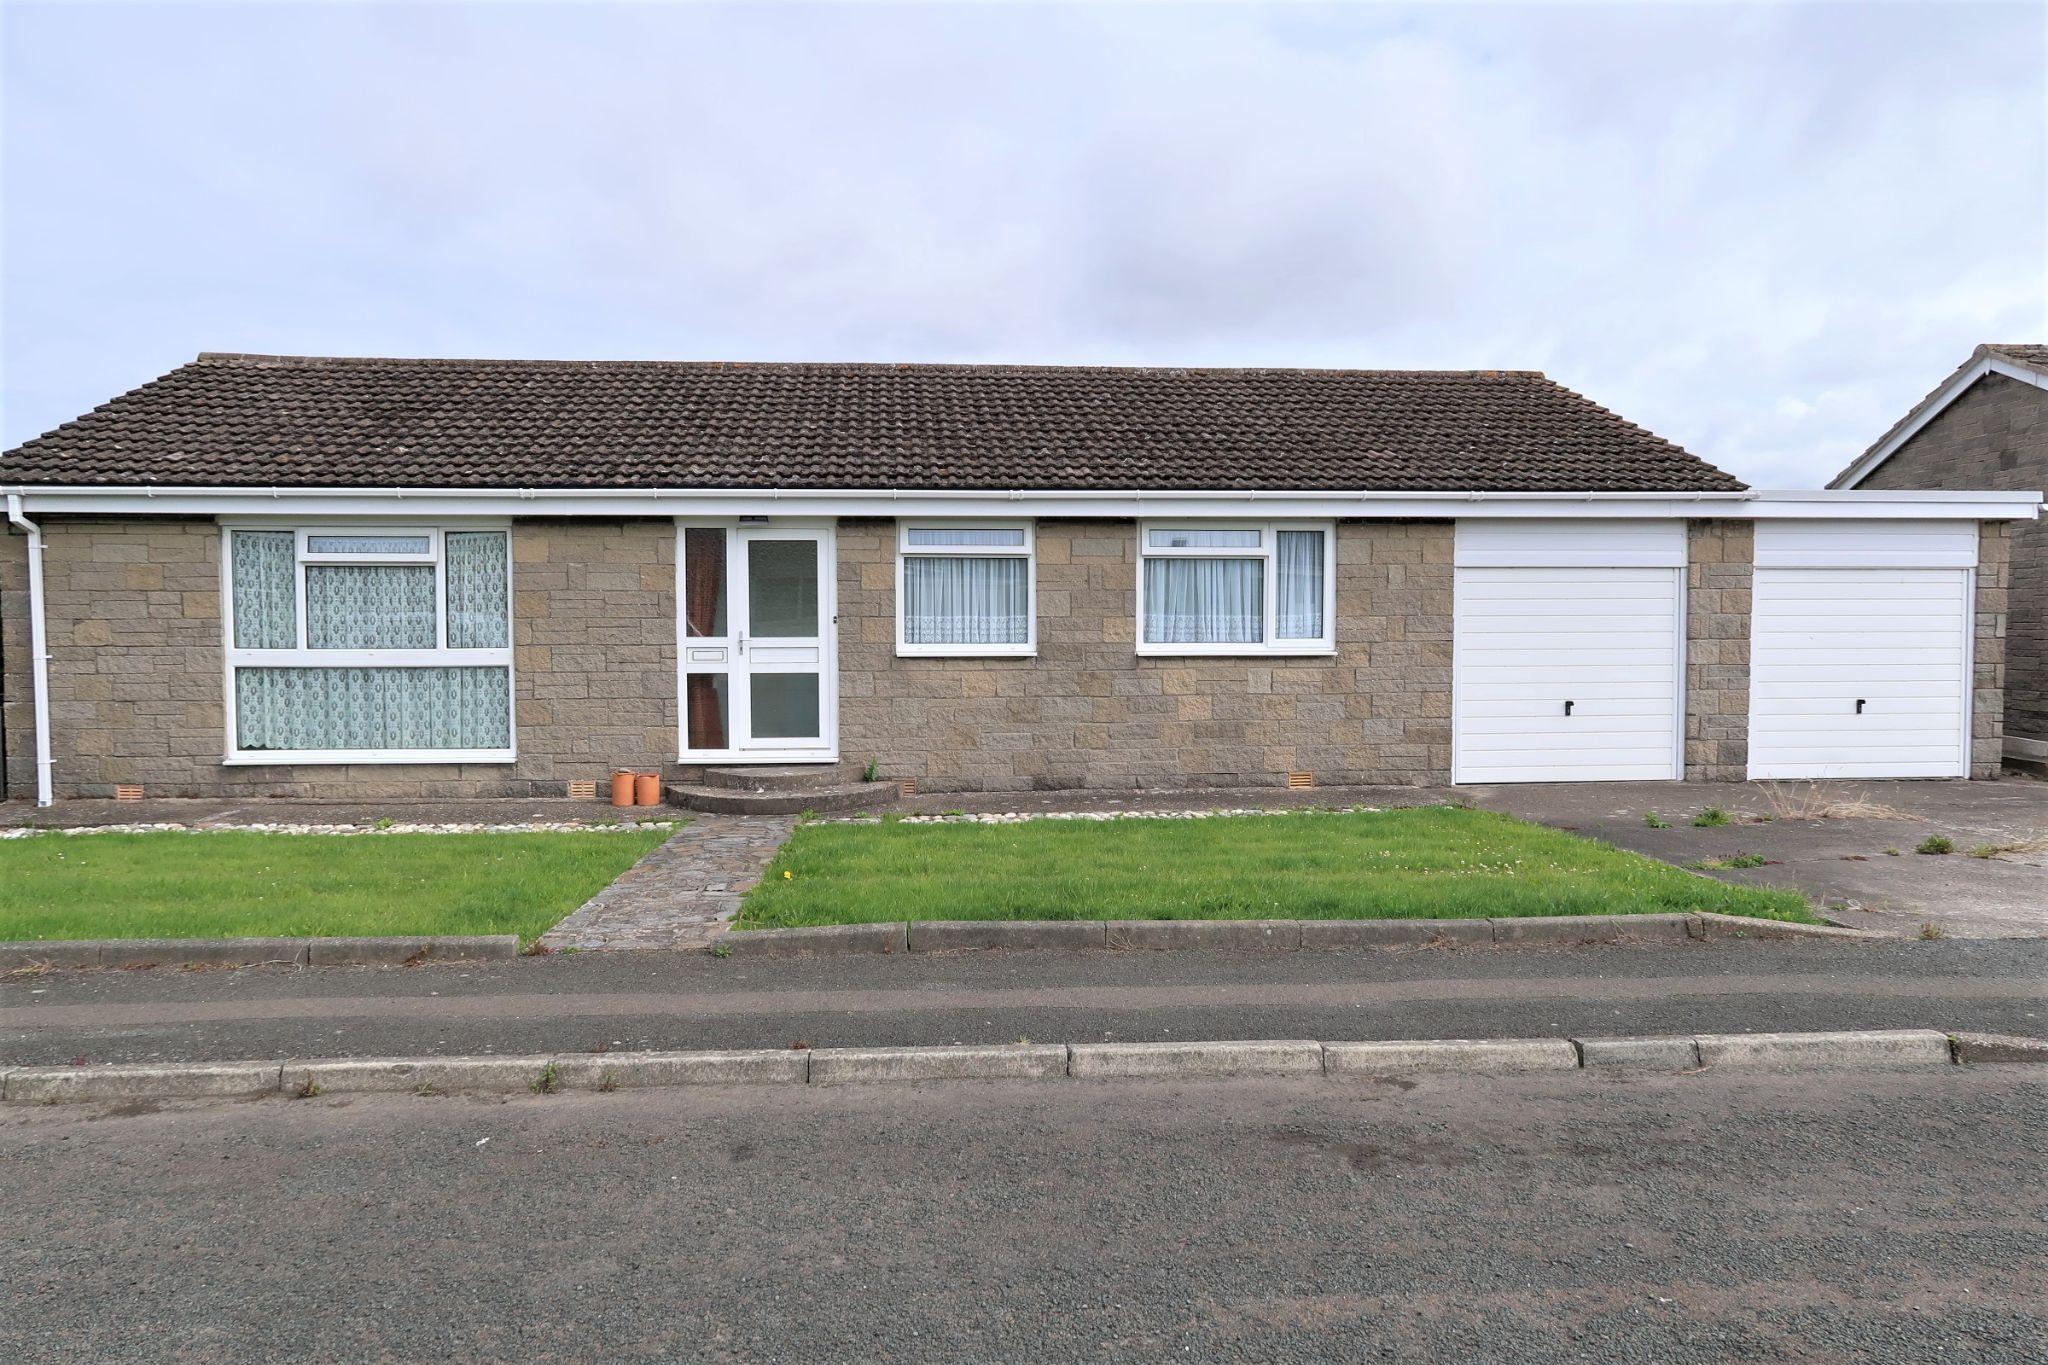 3 bedroom detached bungalow Sold in Port Erin - Photograph 16